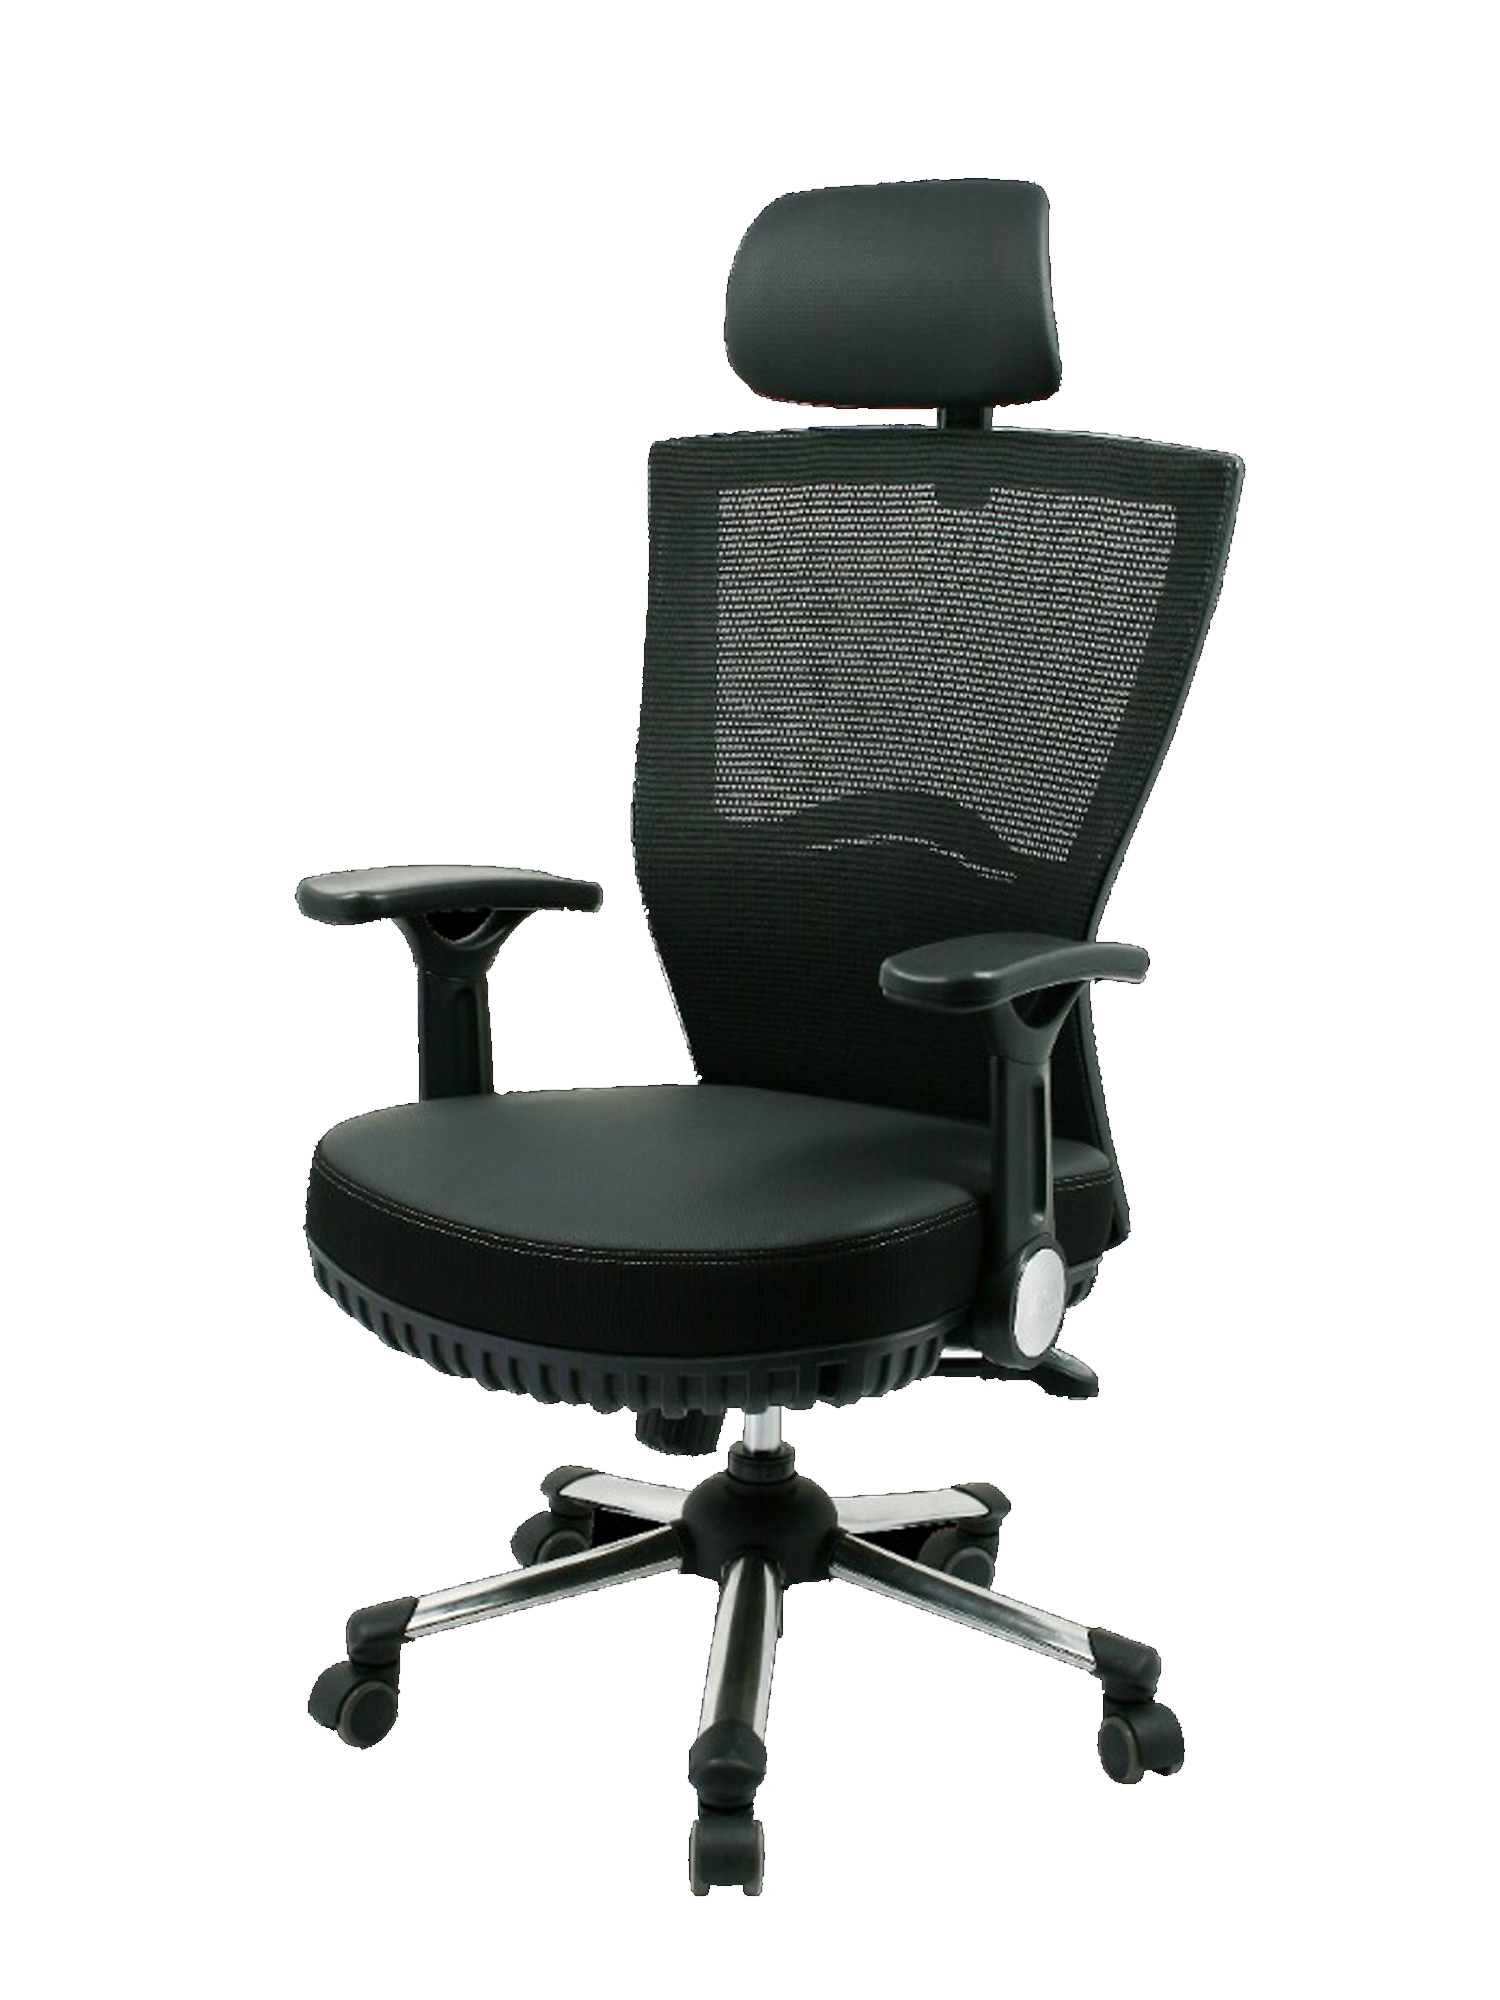 Max Pocket Spring Chair Csp